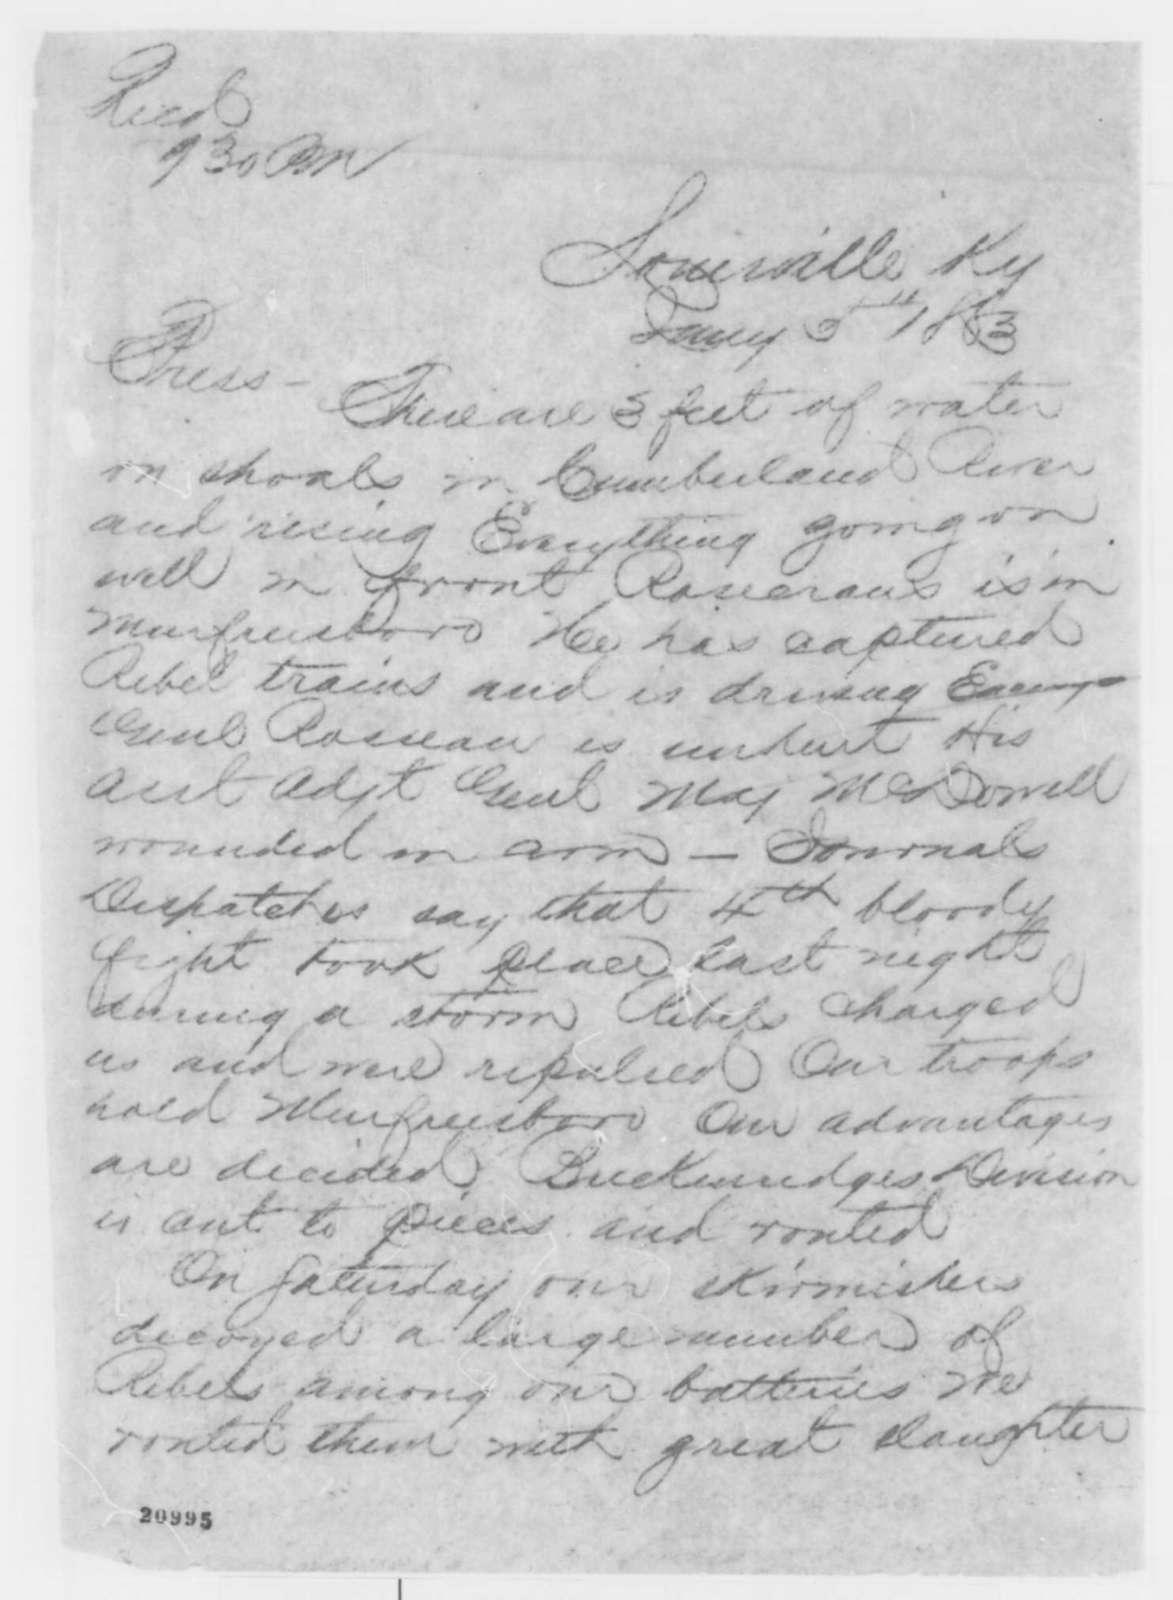 Louisville Kentucky Telegraph, Monday, January 05, 1863  (Telegram reporting military developments in Tennessee)